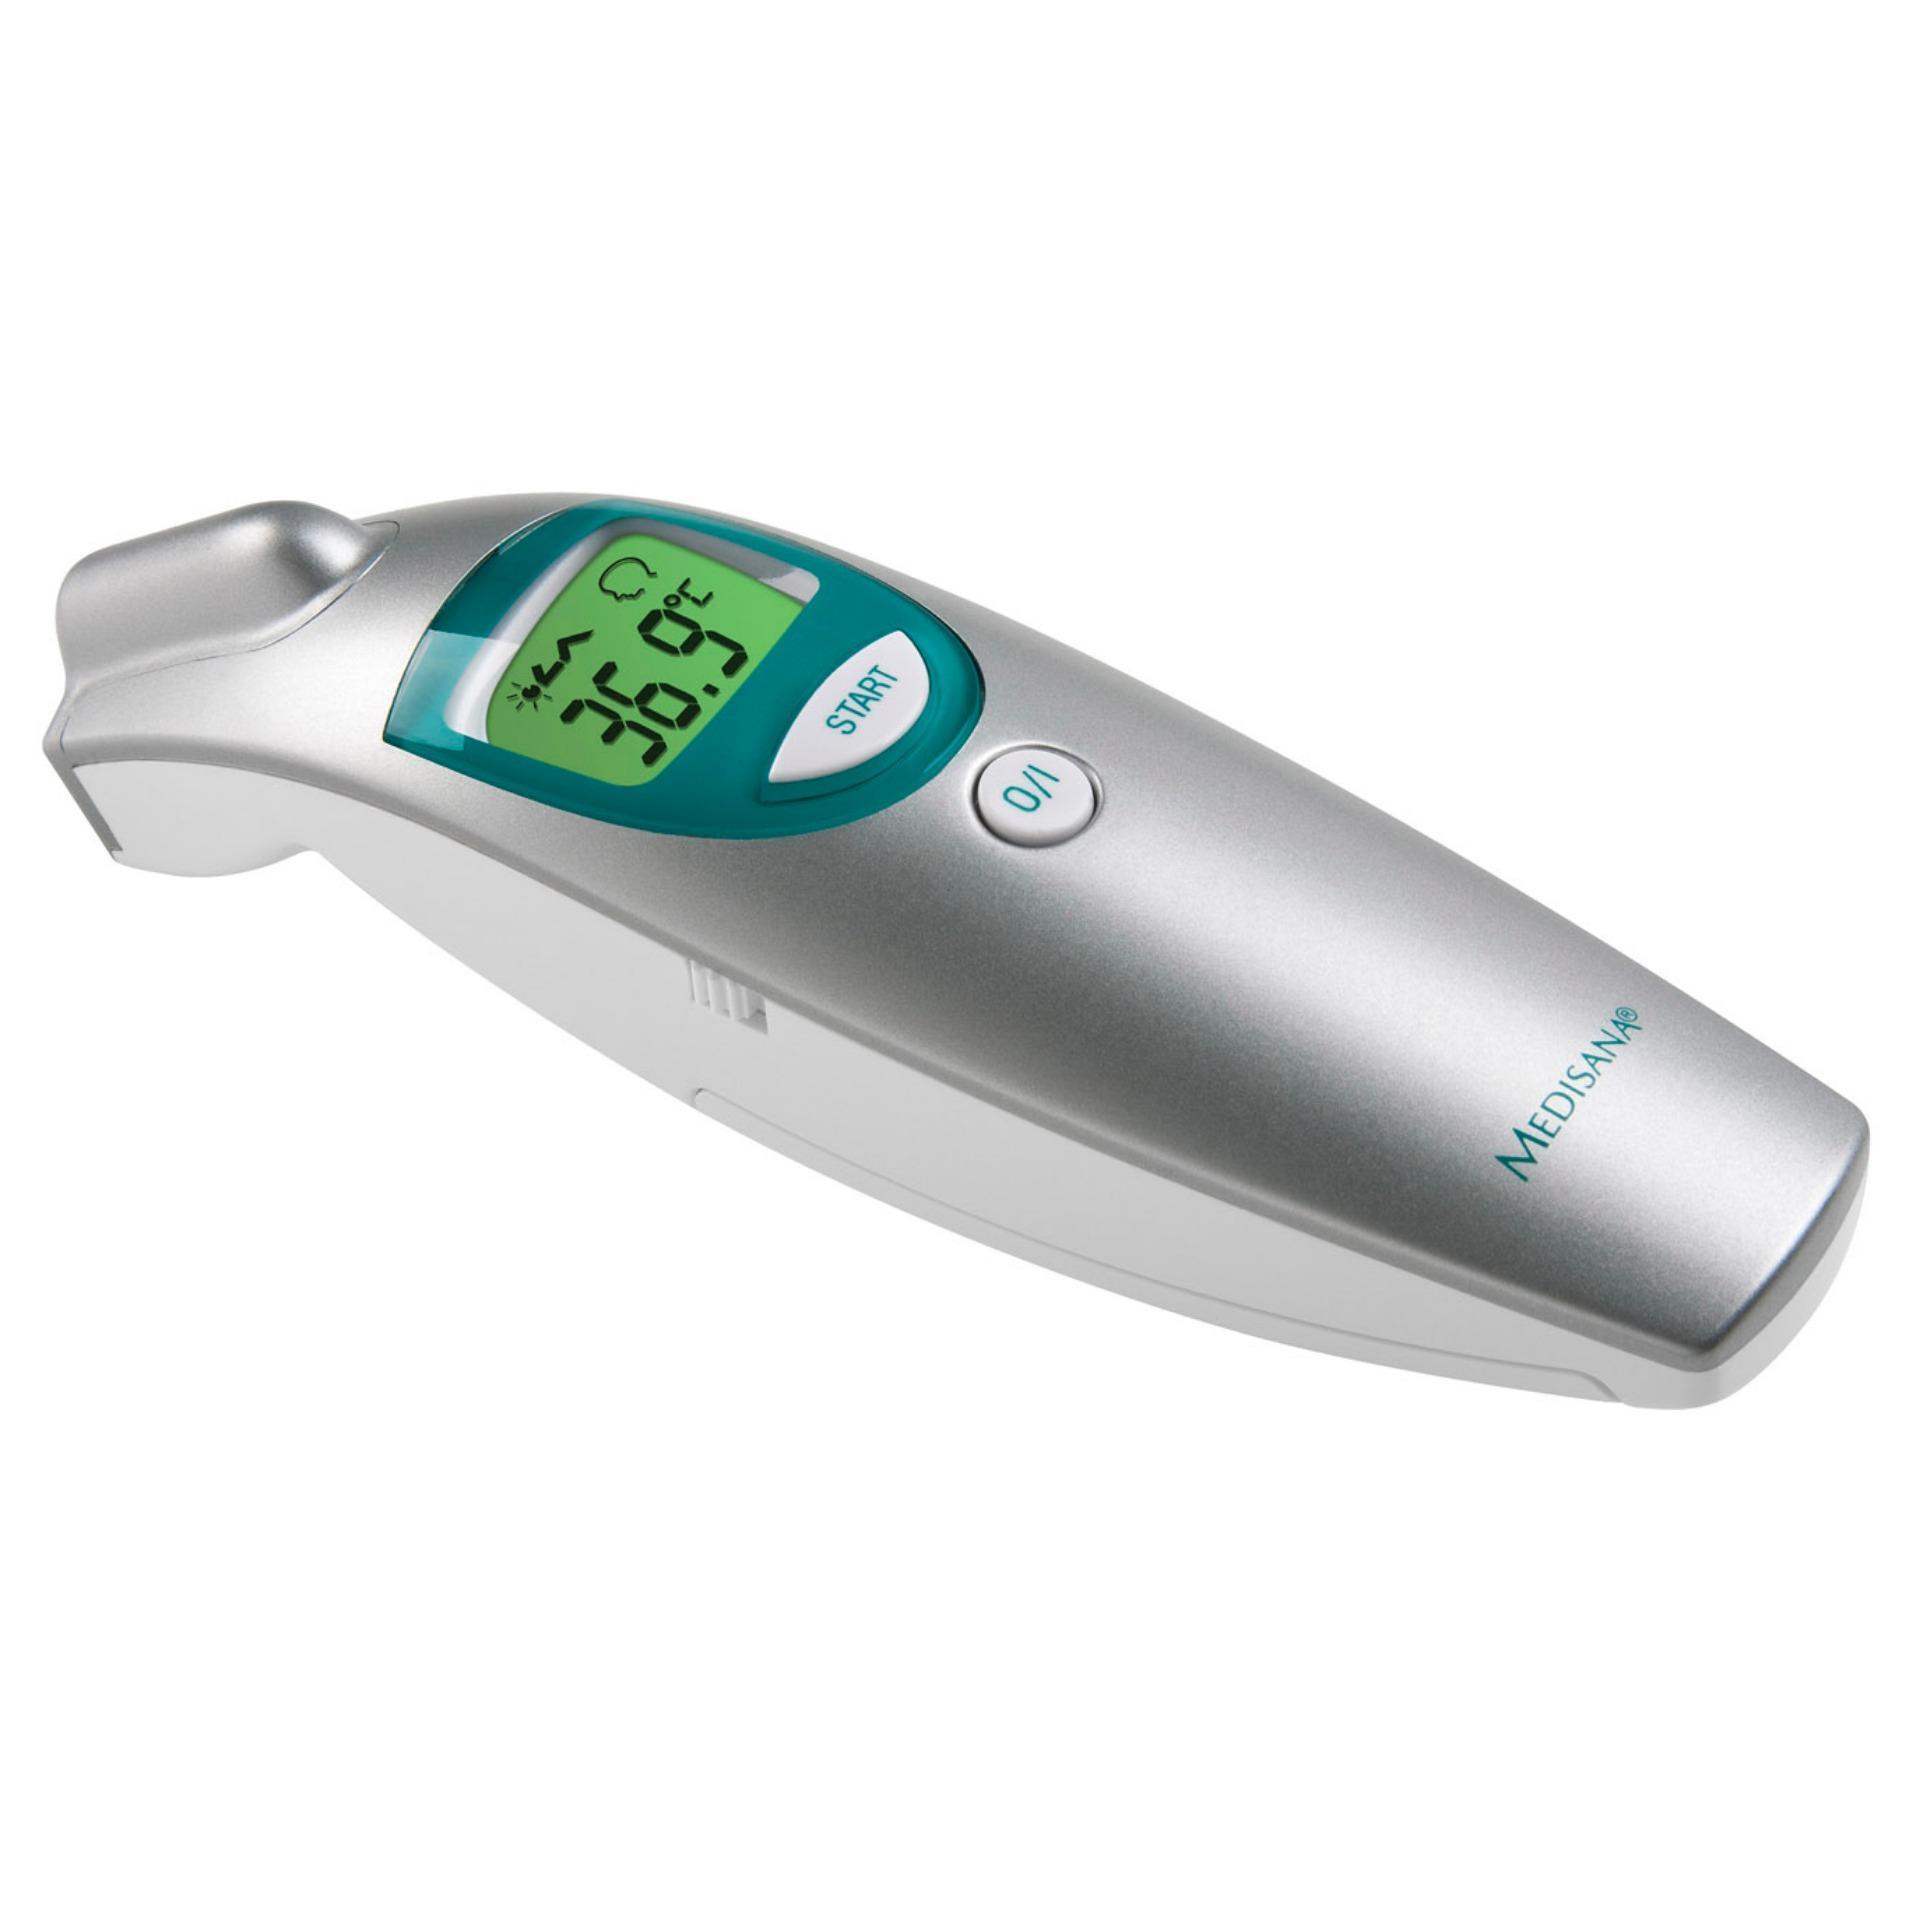 Harga Thermometer Infrared Anak Ftn Medisana Origin